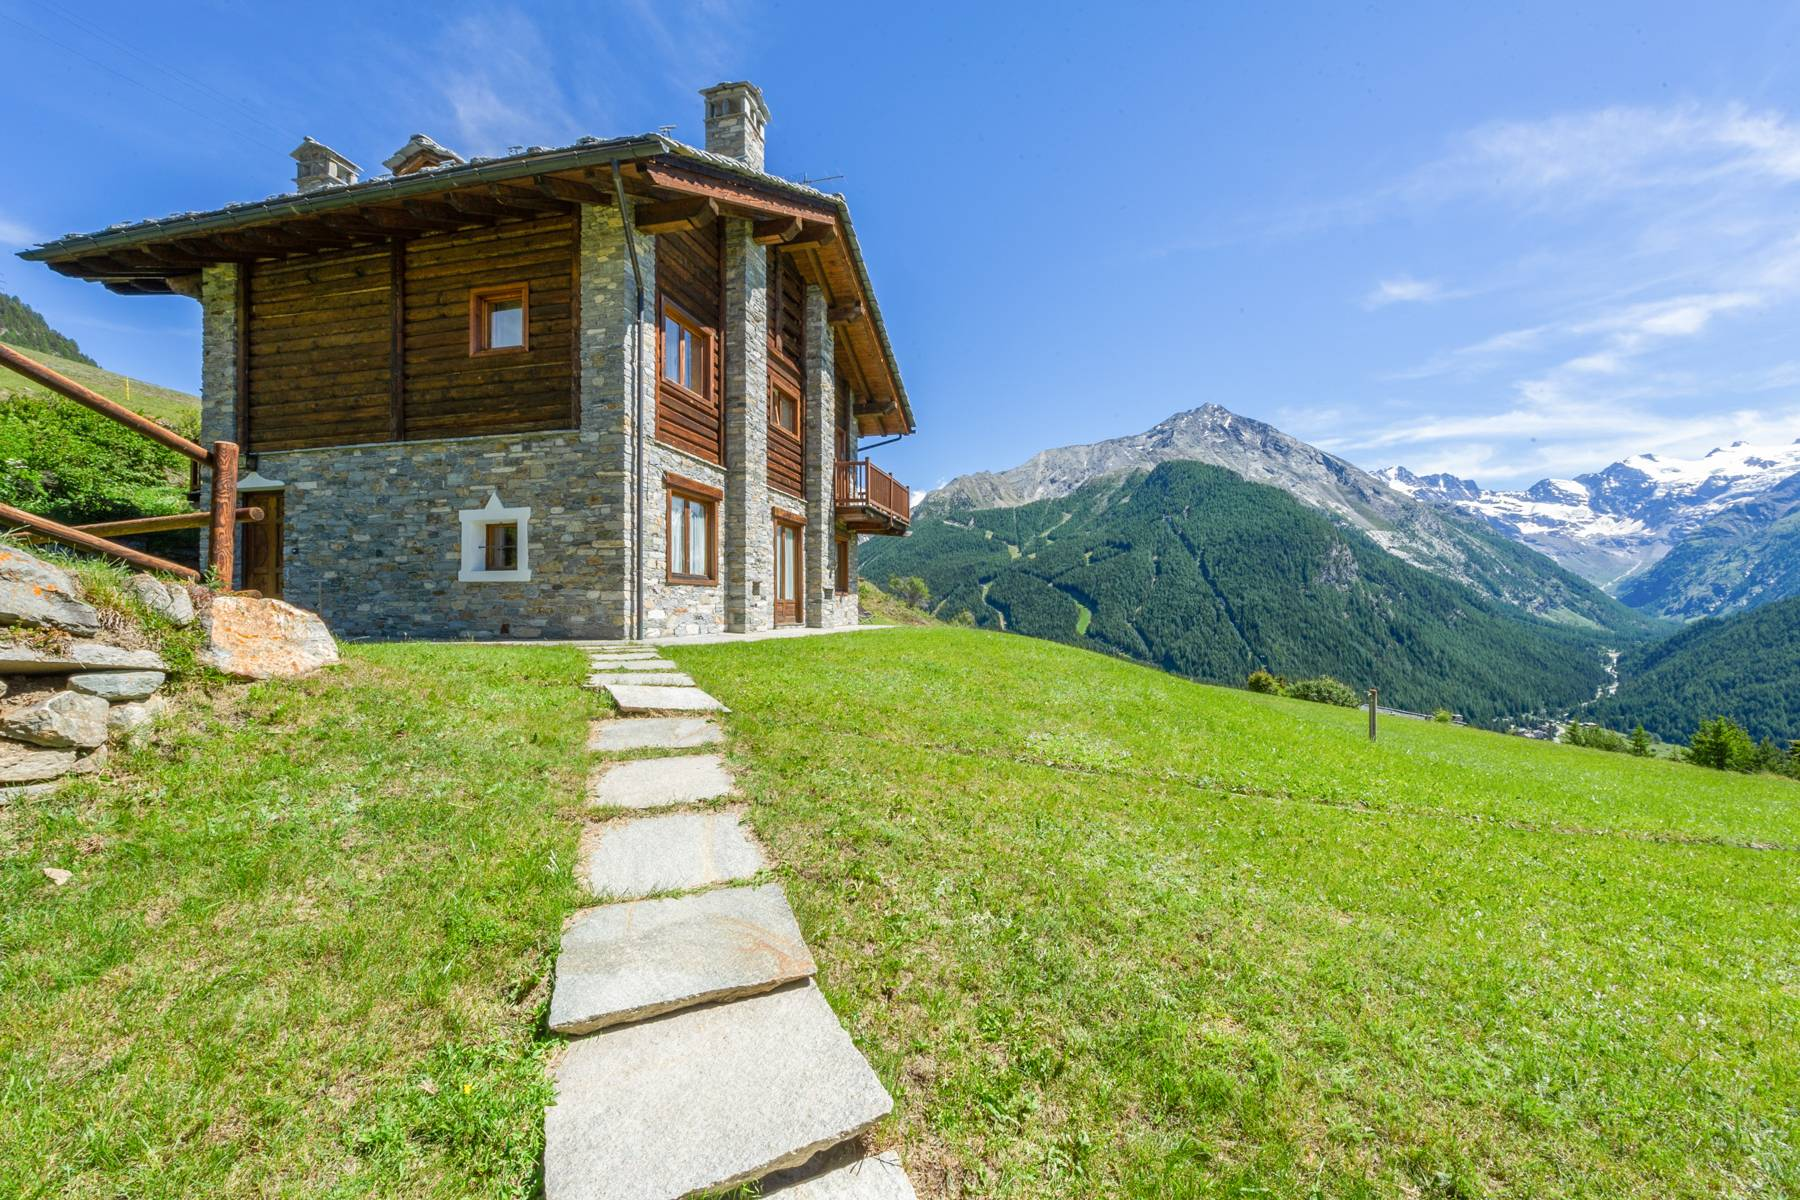 Villa in Vendita a Cogne: 5 locali, 377 mq - Foto 21